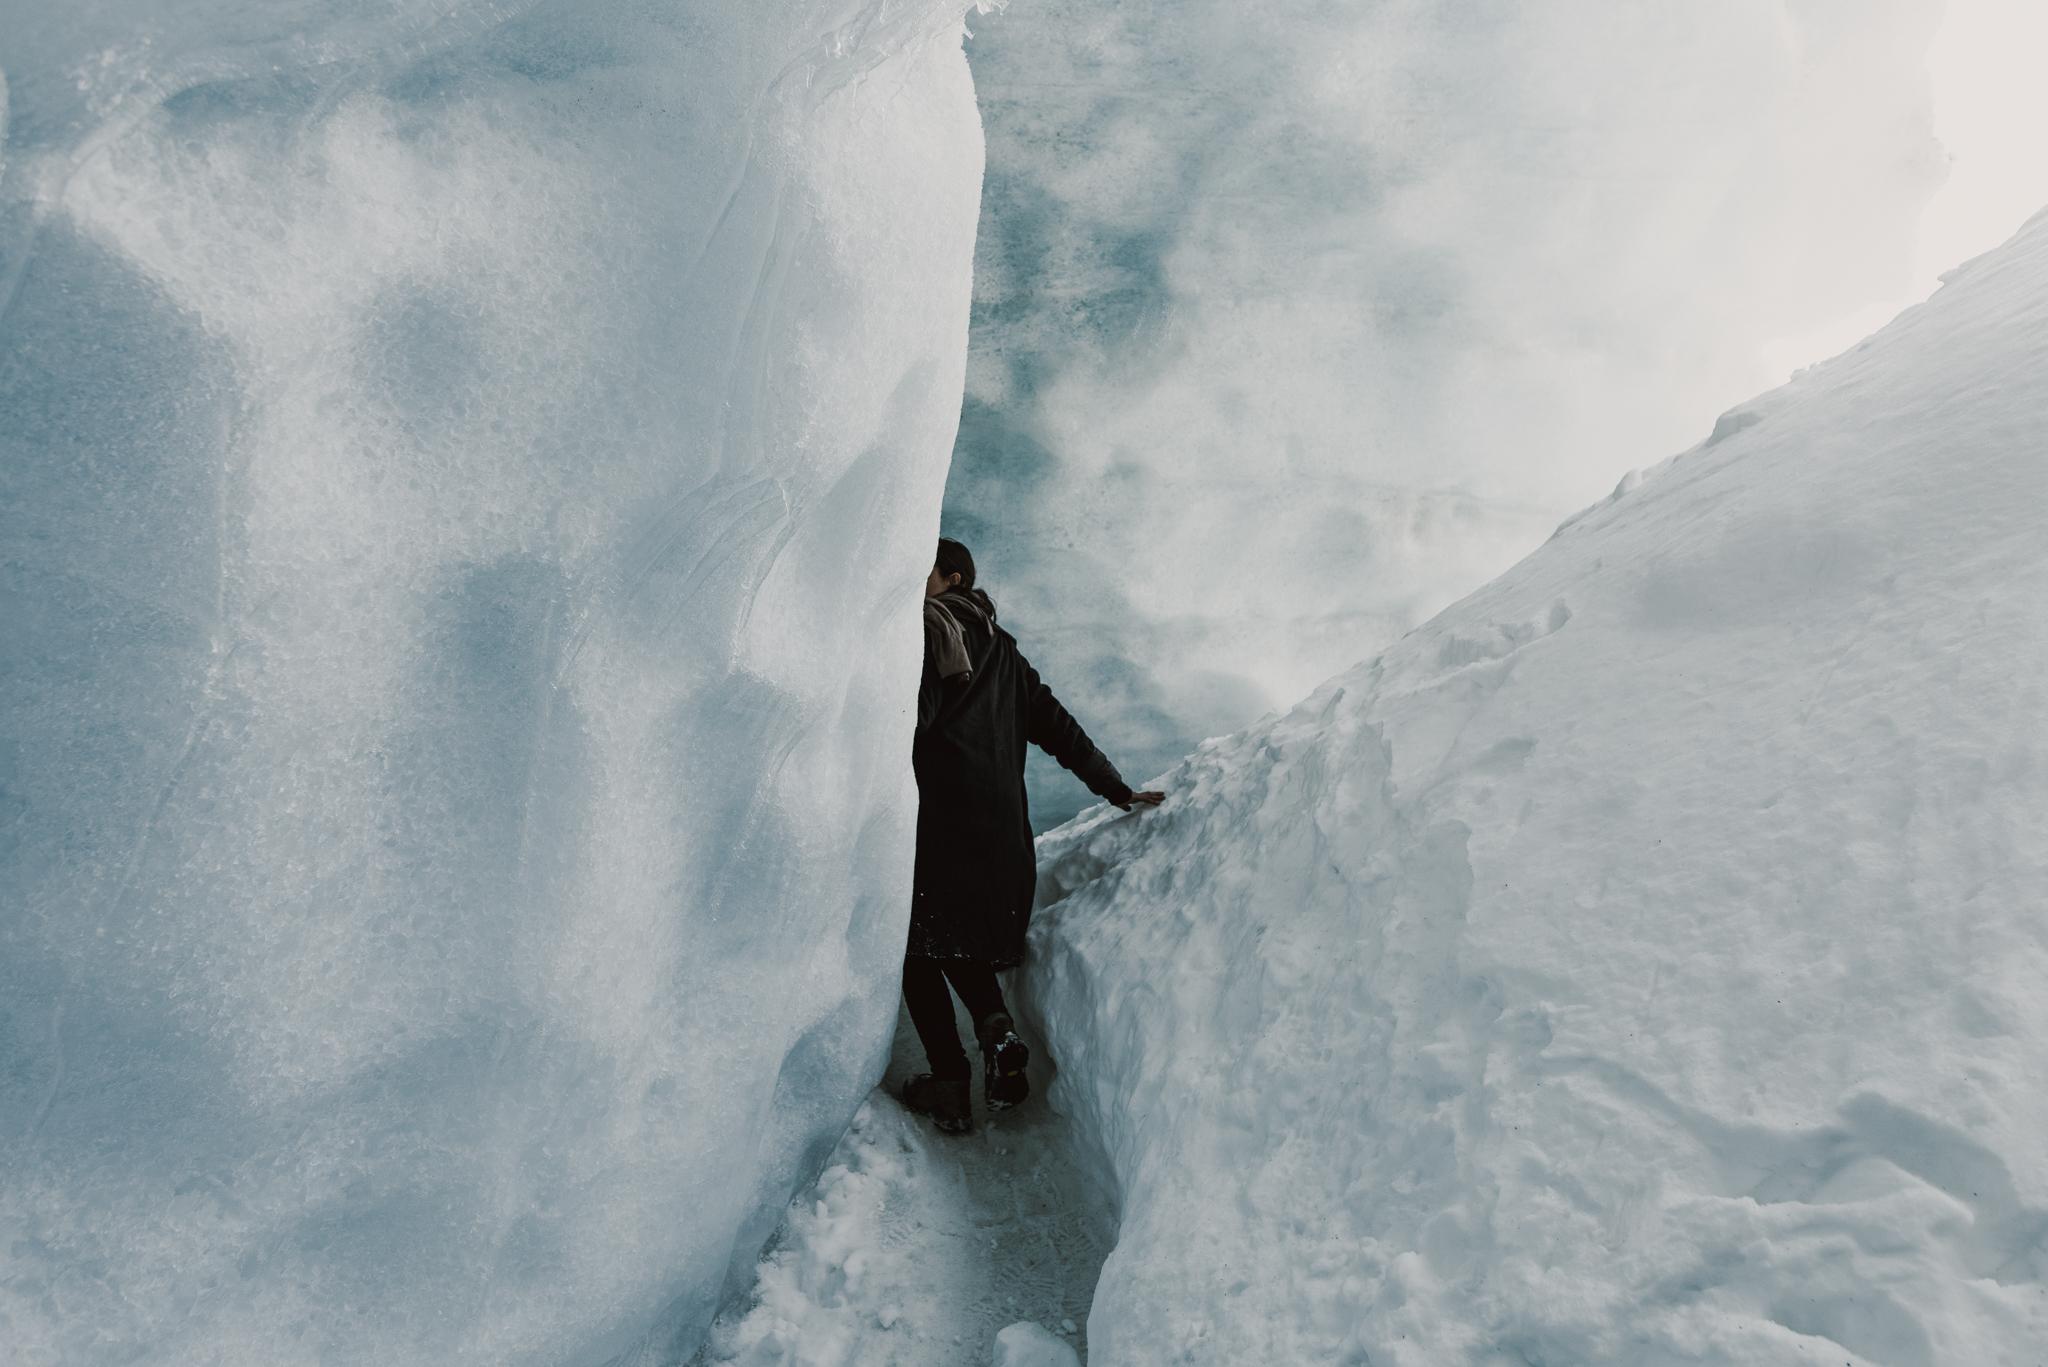 ©The-Ryans-Photo---Athabasca-Glacier,-Ice-Cave-035.jpg